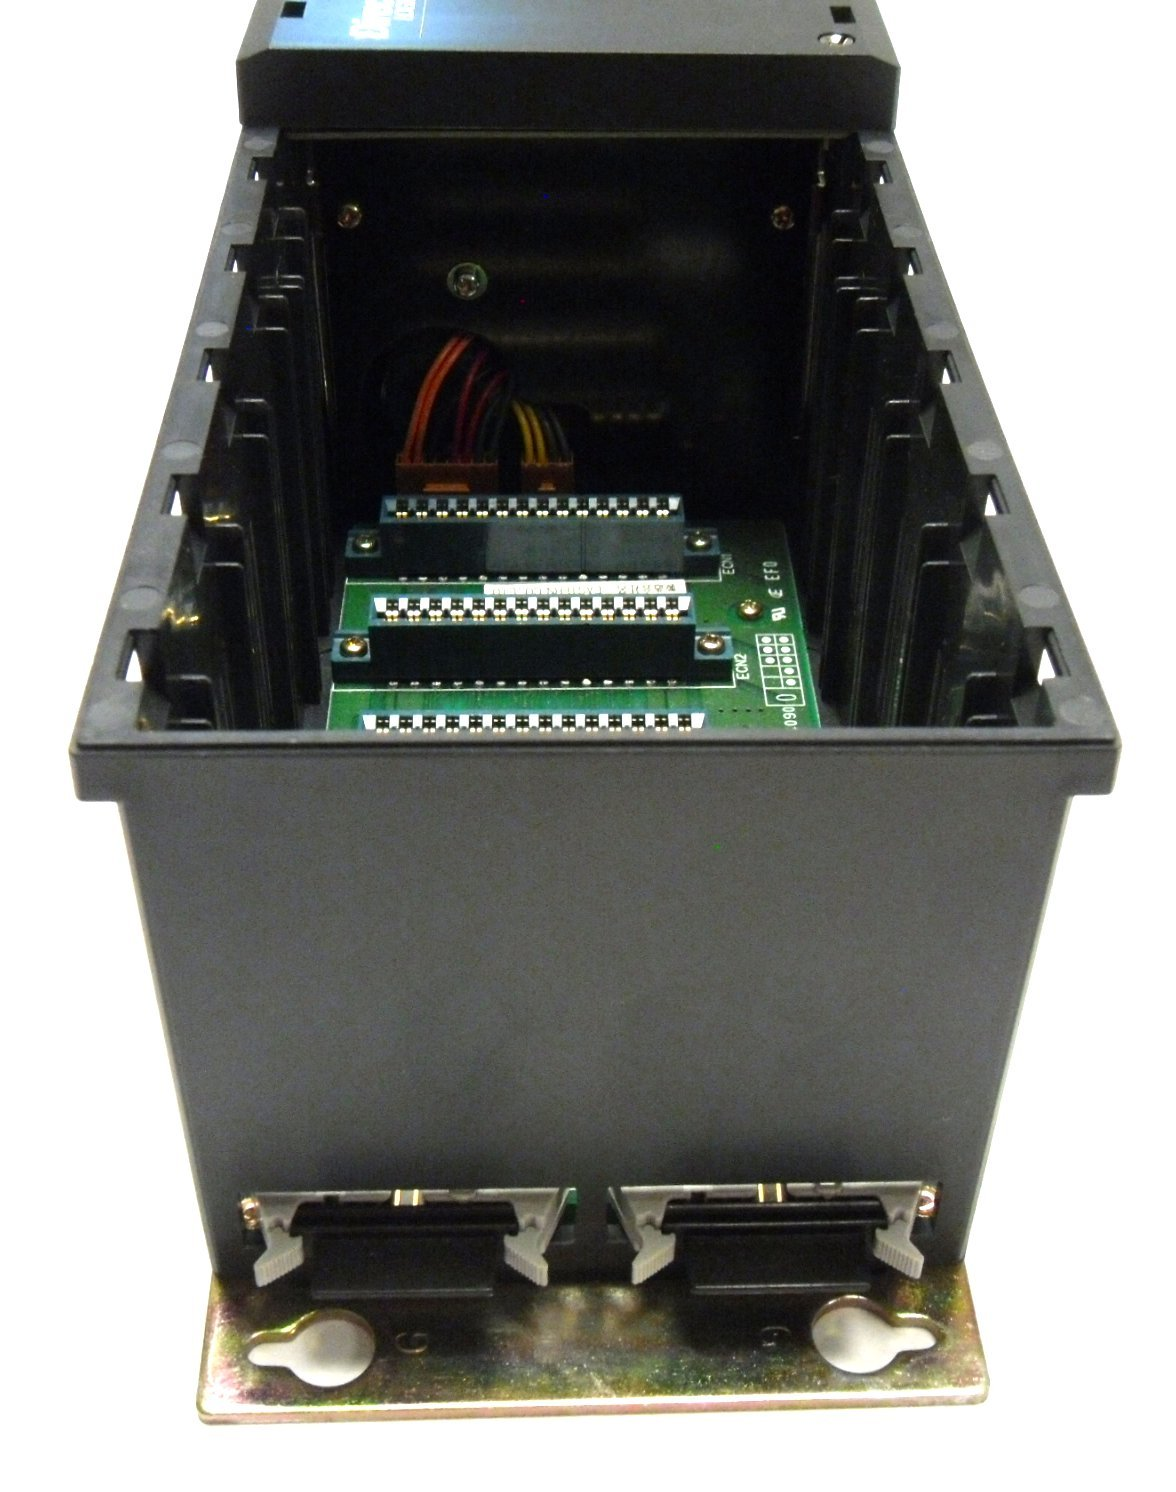 New in Box DIRECT LOGIC D3-05B-1 Panel Mount 5 Slot Series 305